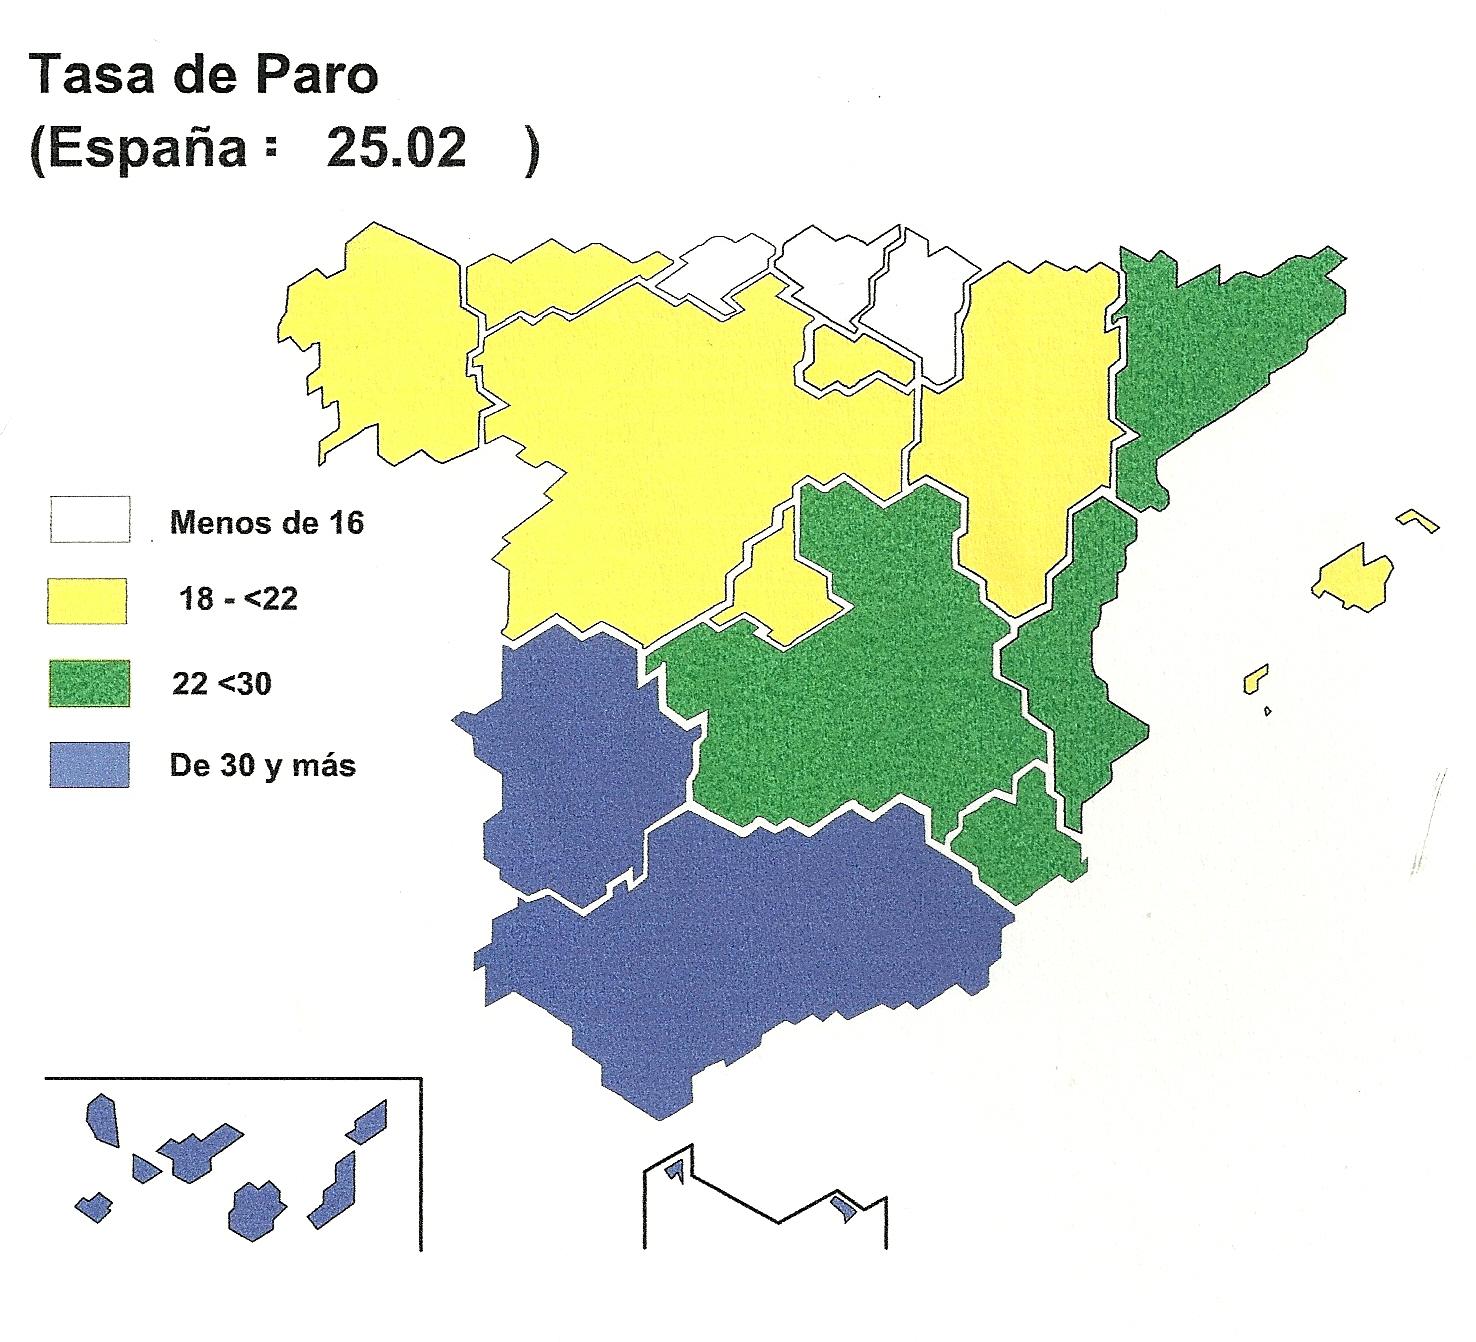 external image Tasa+de+paro+en+Espa%C3%B1a,+por+edades.+INE.+3%C2%BA+T.2012.jpg